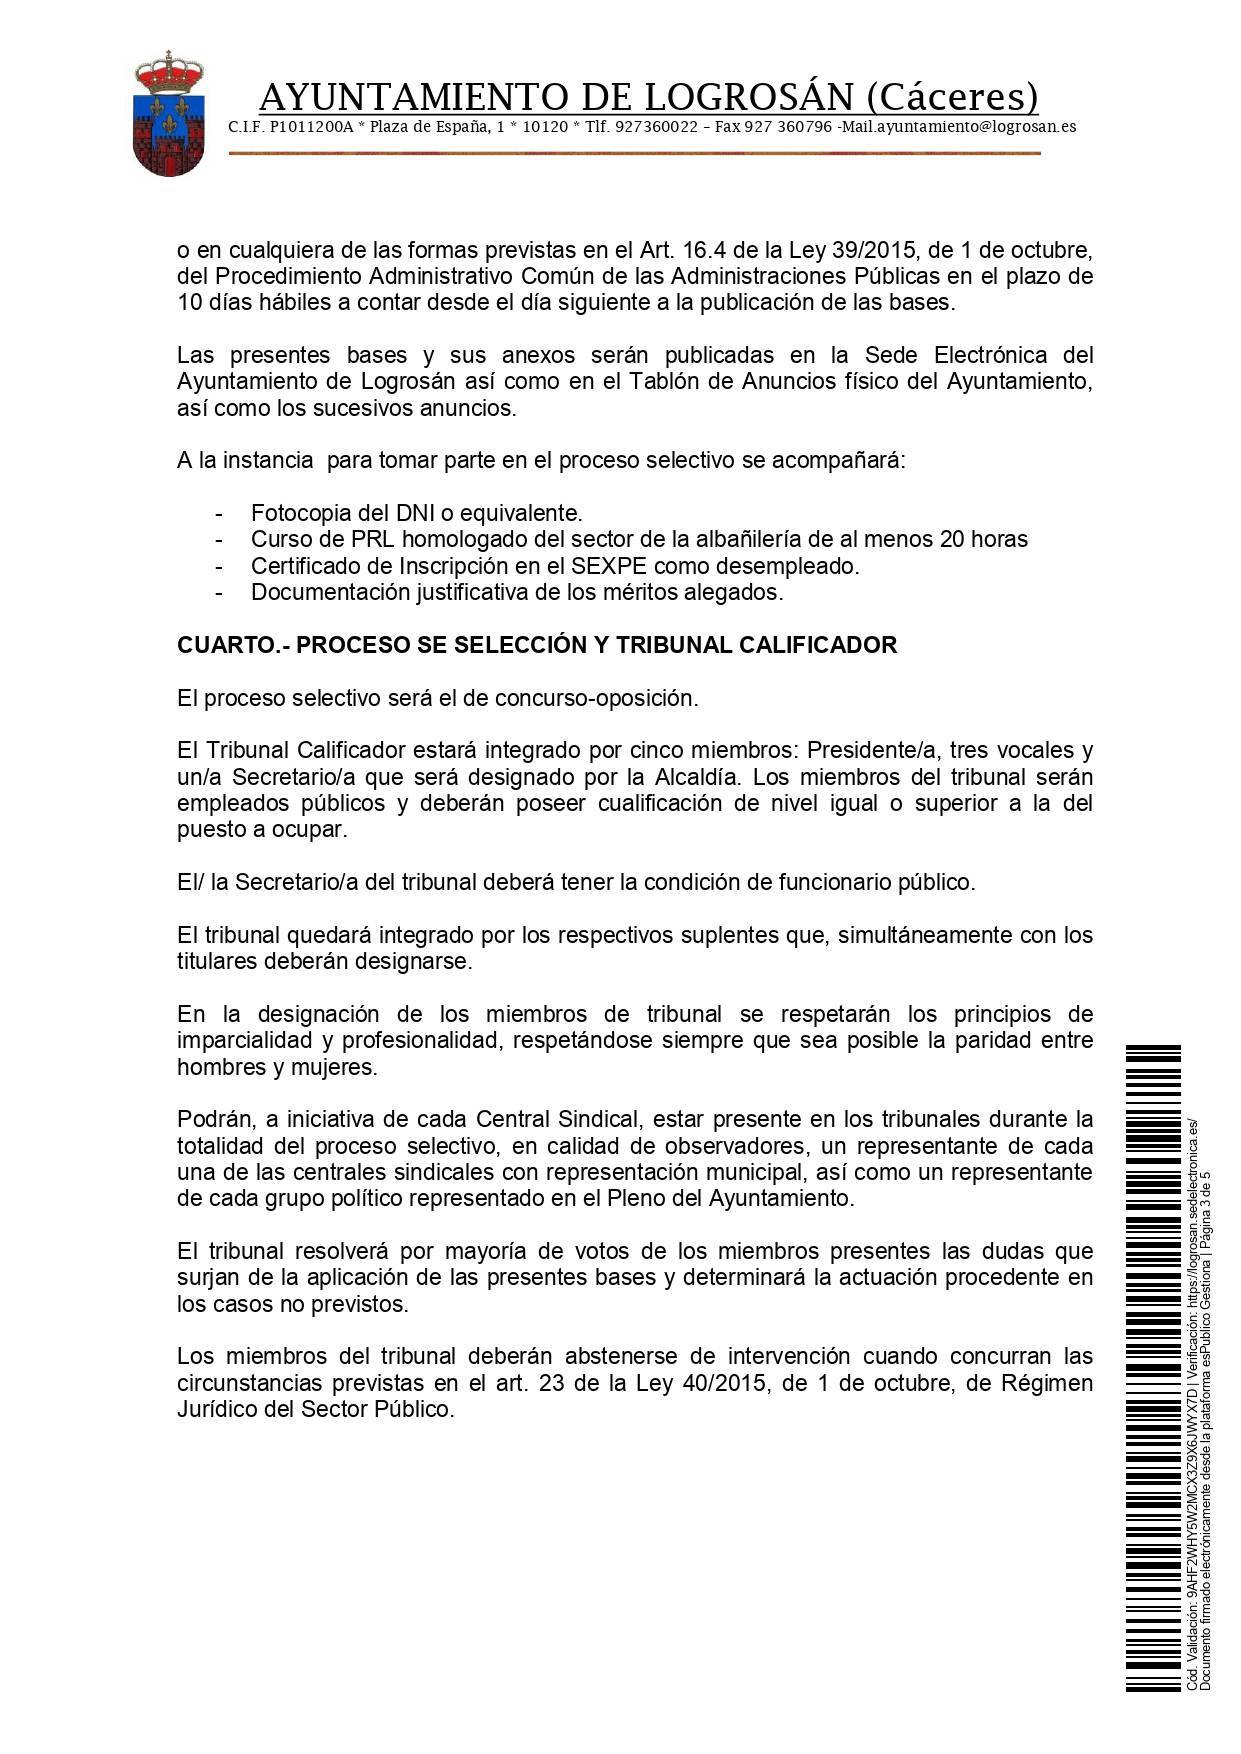 2 oficiales de construcción (2021) - Logrosán (Cáceres) 3